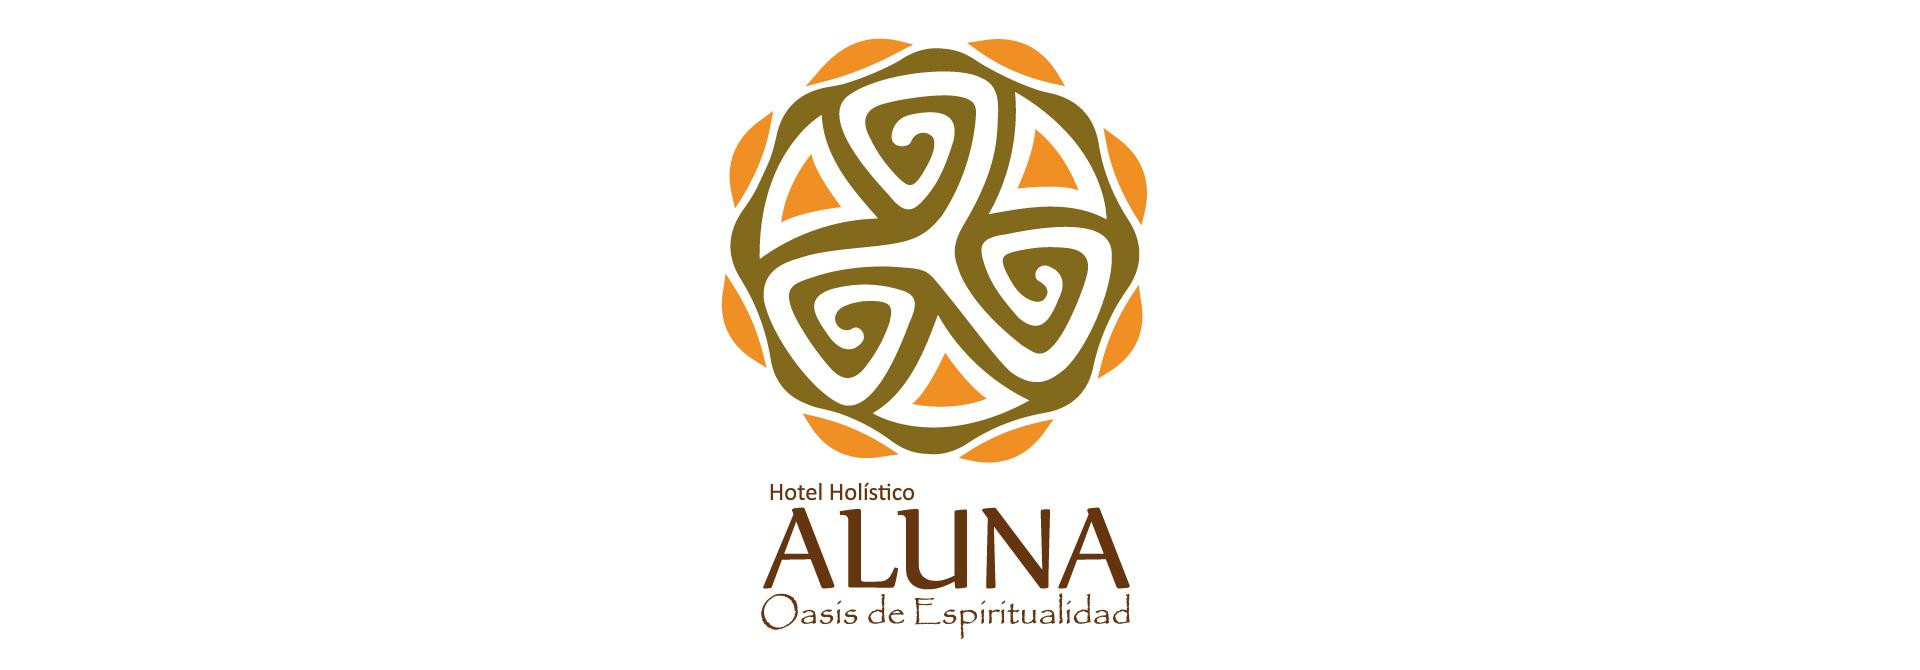 logotipos-villa-de-leyva